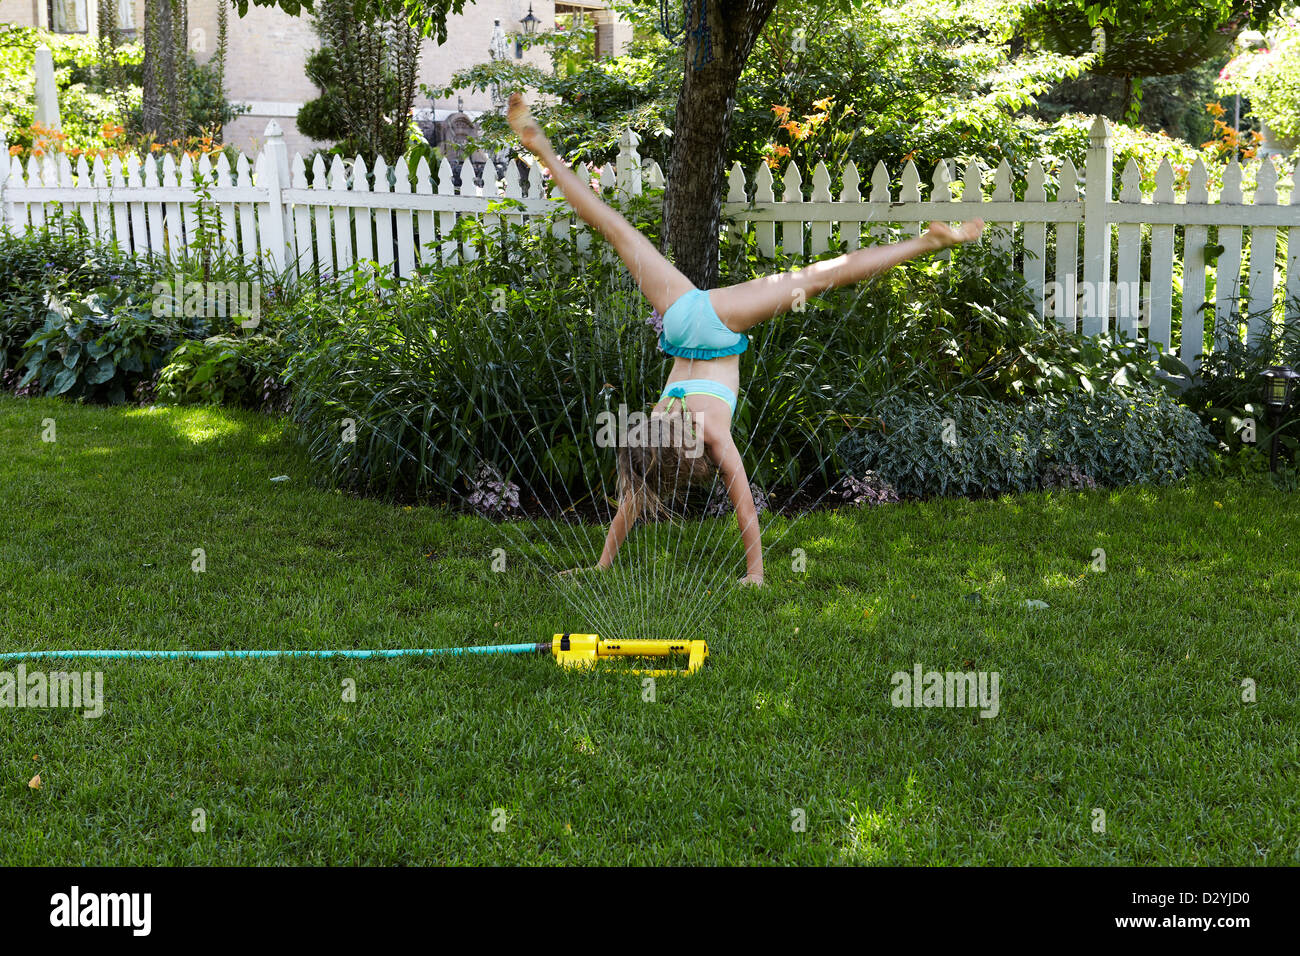 9 year old girl doing cartwheel on lawn - Stock Image